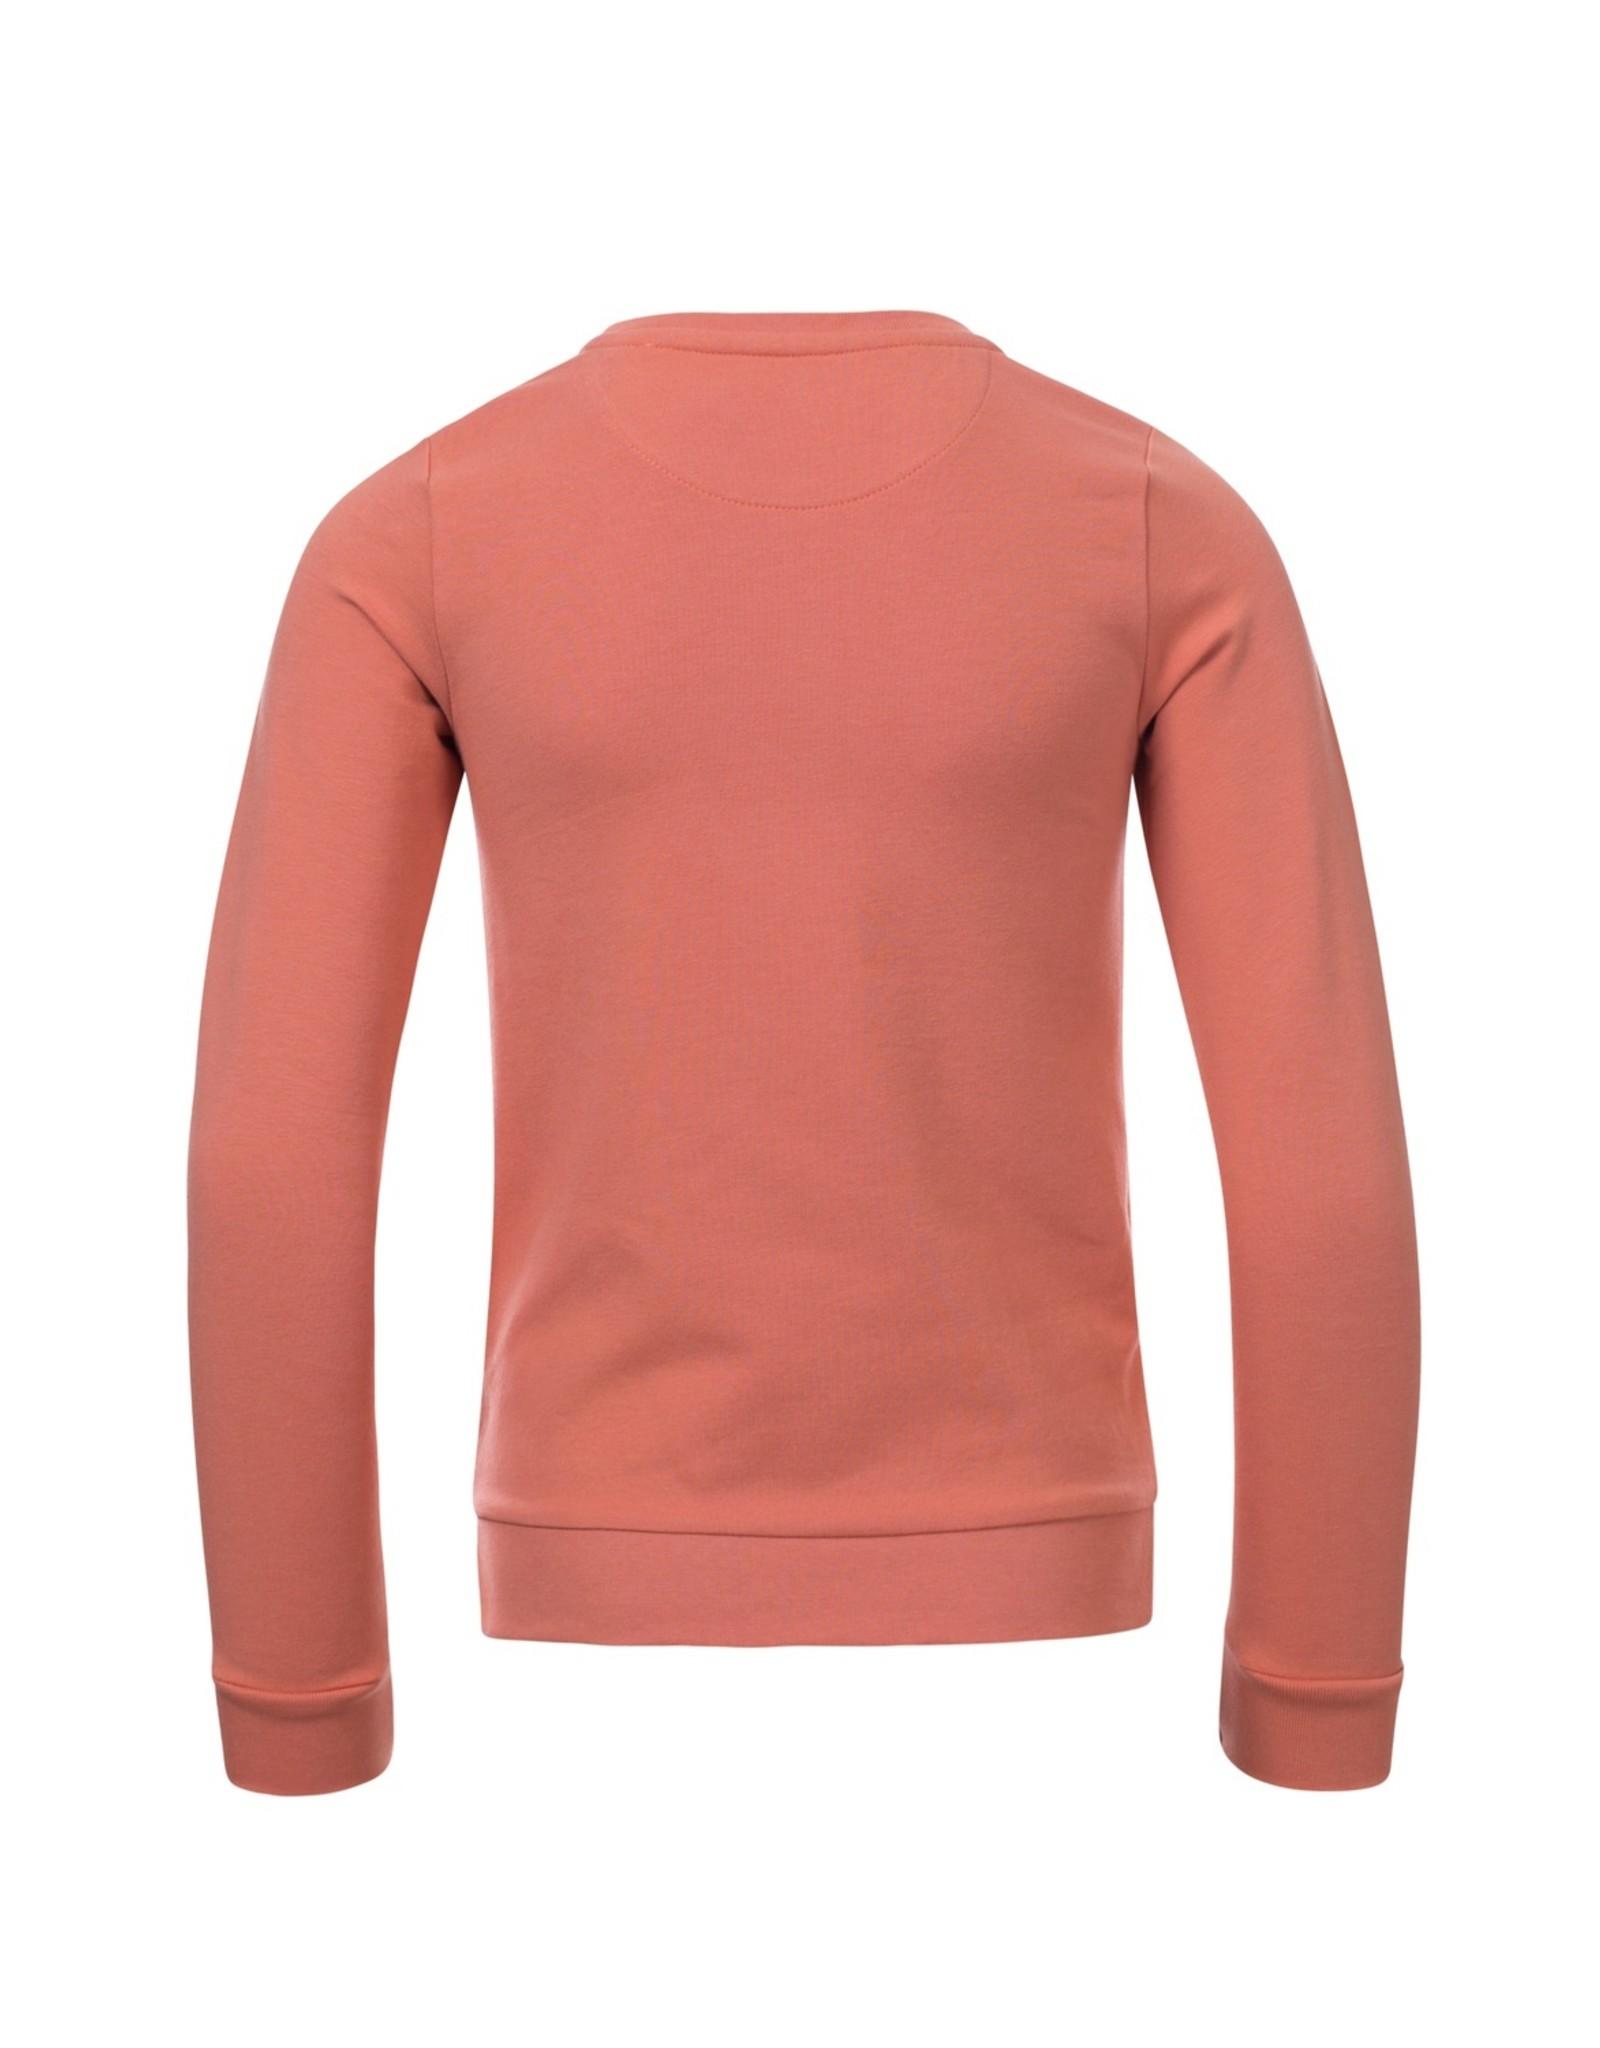 Looxs 10SIXTEEN Girls sweater s